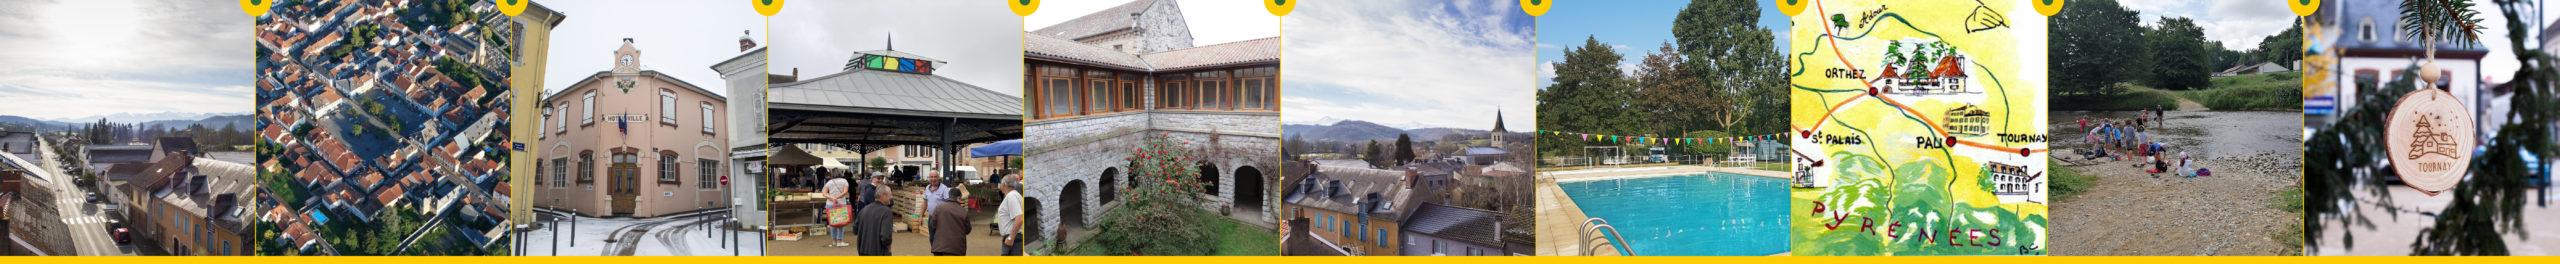 Mairie de Tournay / Hautes-Pyrénées